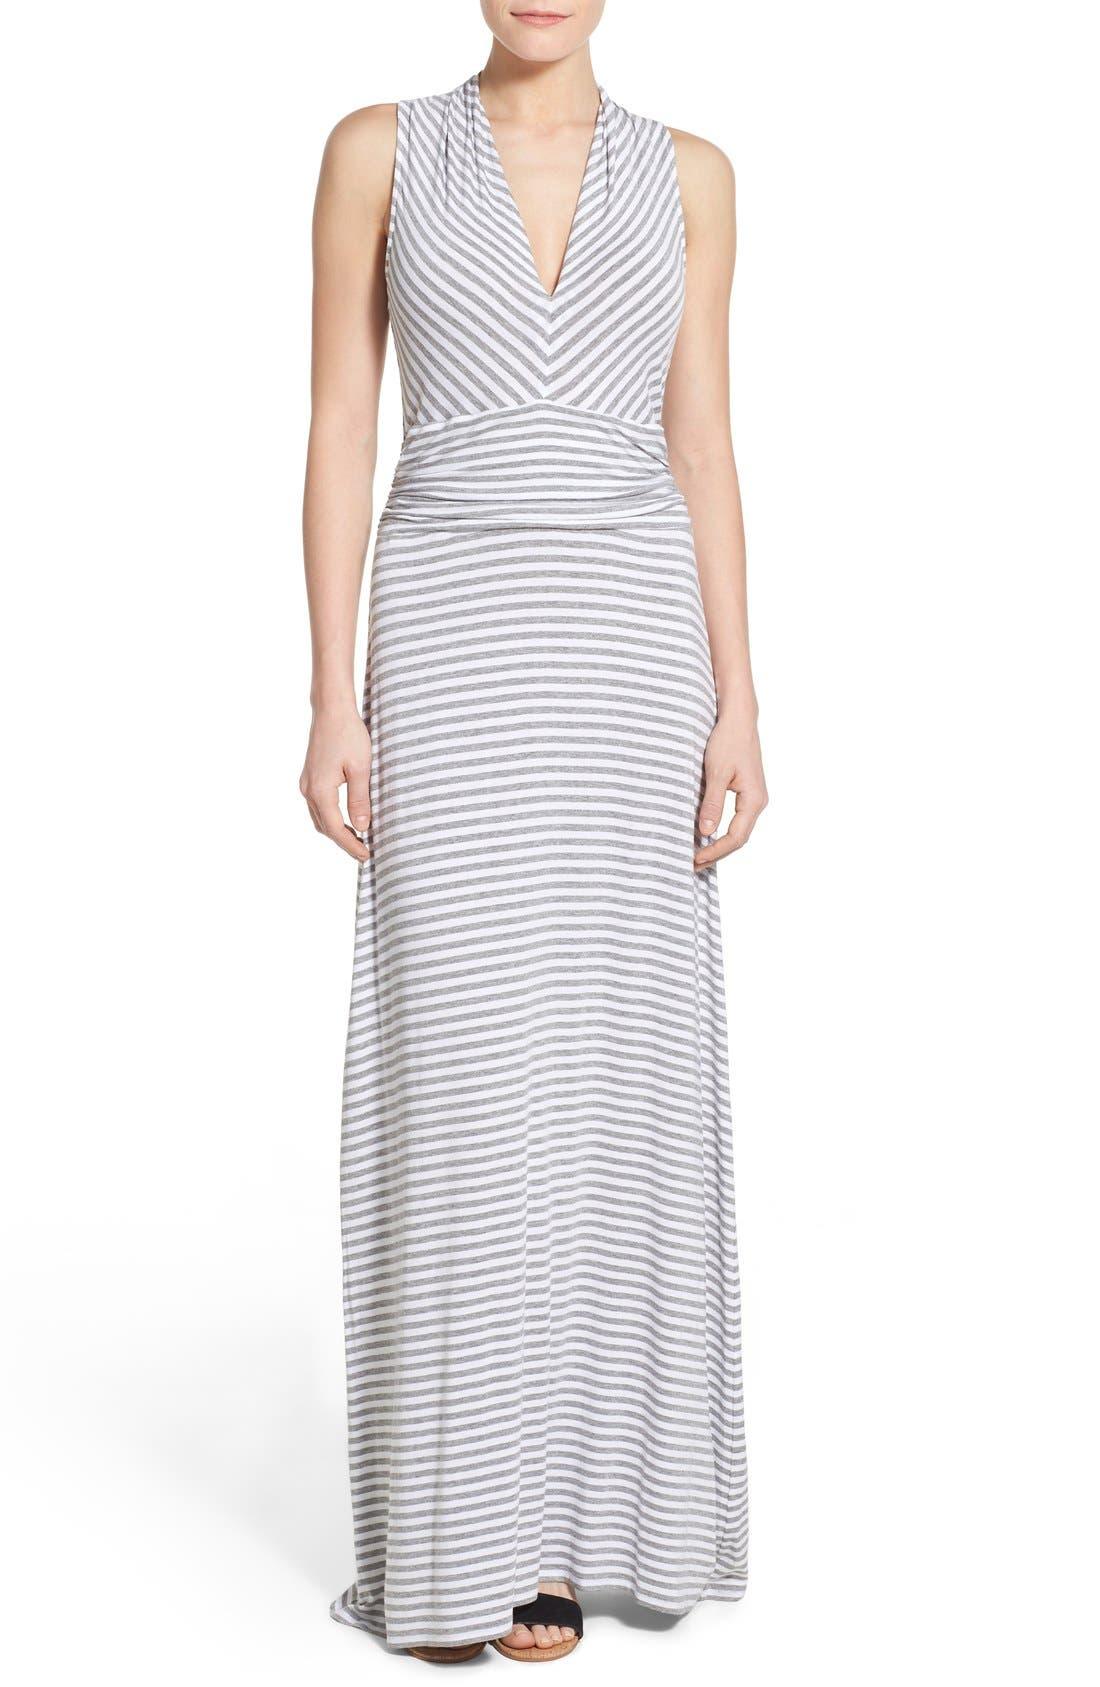 Alternate Image 1 Selected - Vince Camuto Stripe Jersey Cutaway Shoulder Maxi Dress (Petite)